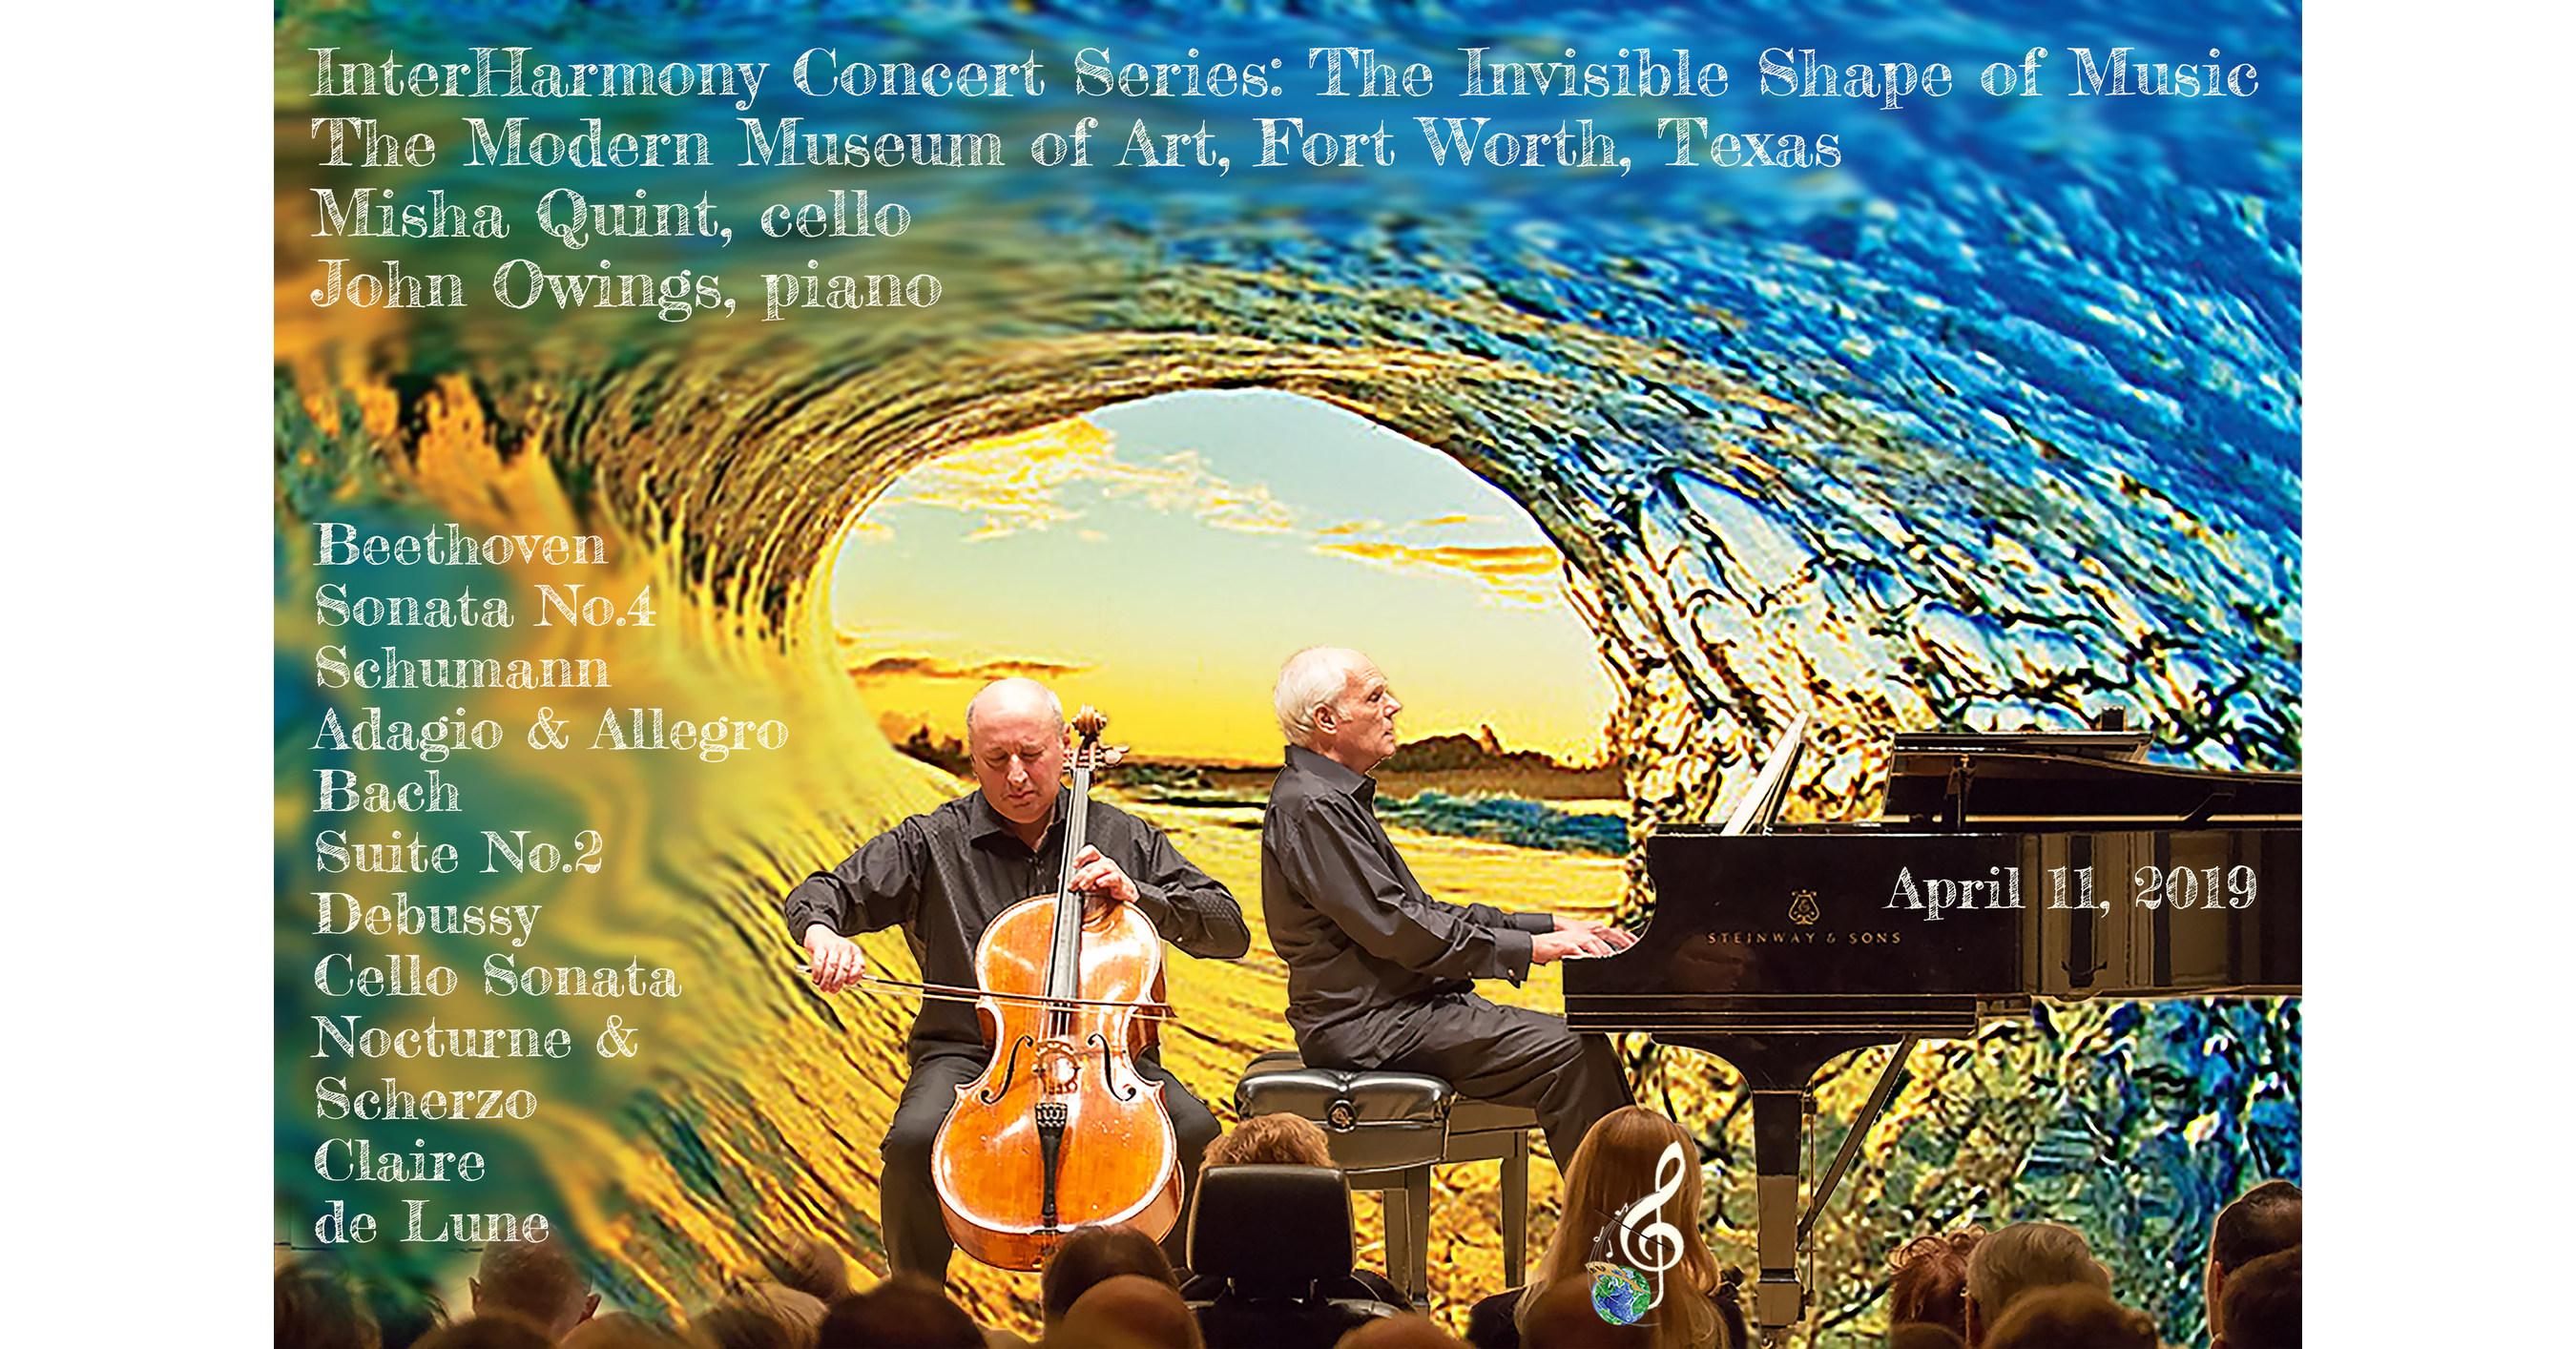 Cellist Misha Quint Pianist John Owings Perform in